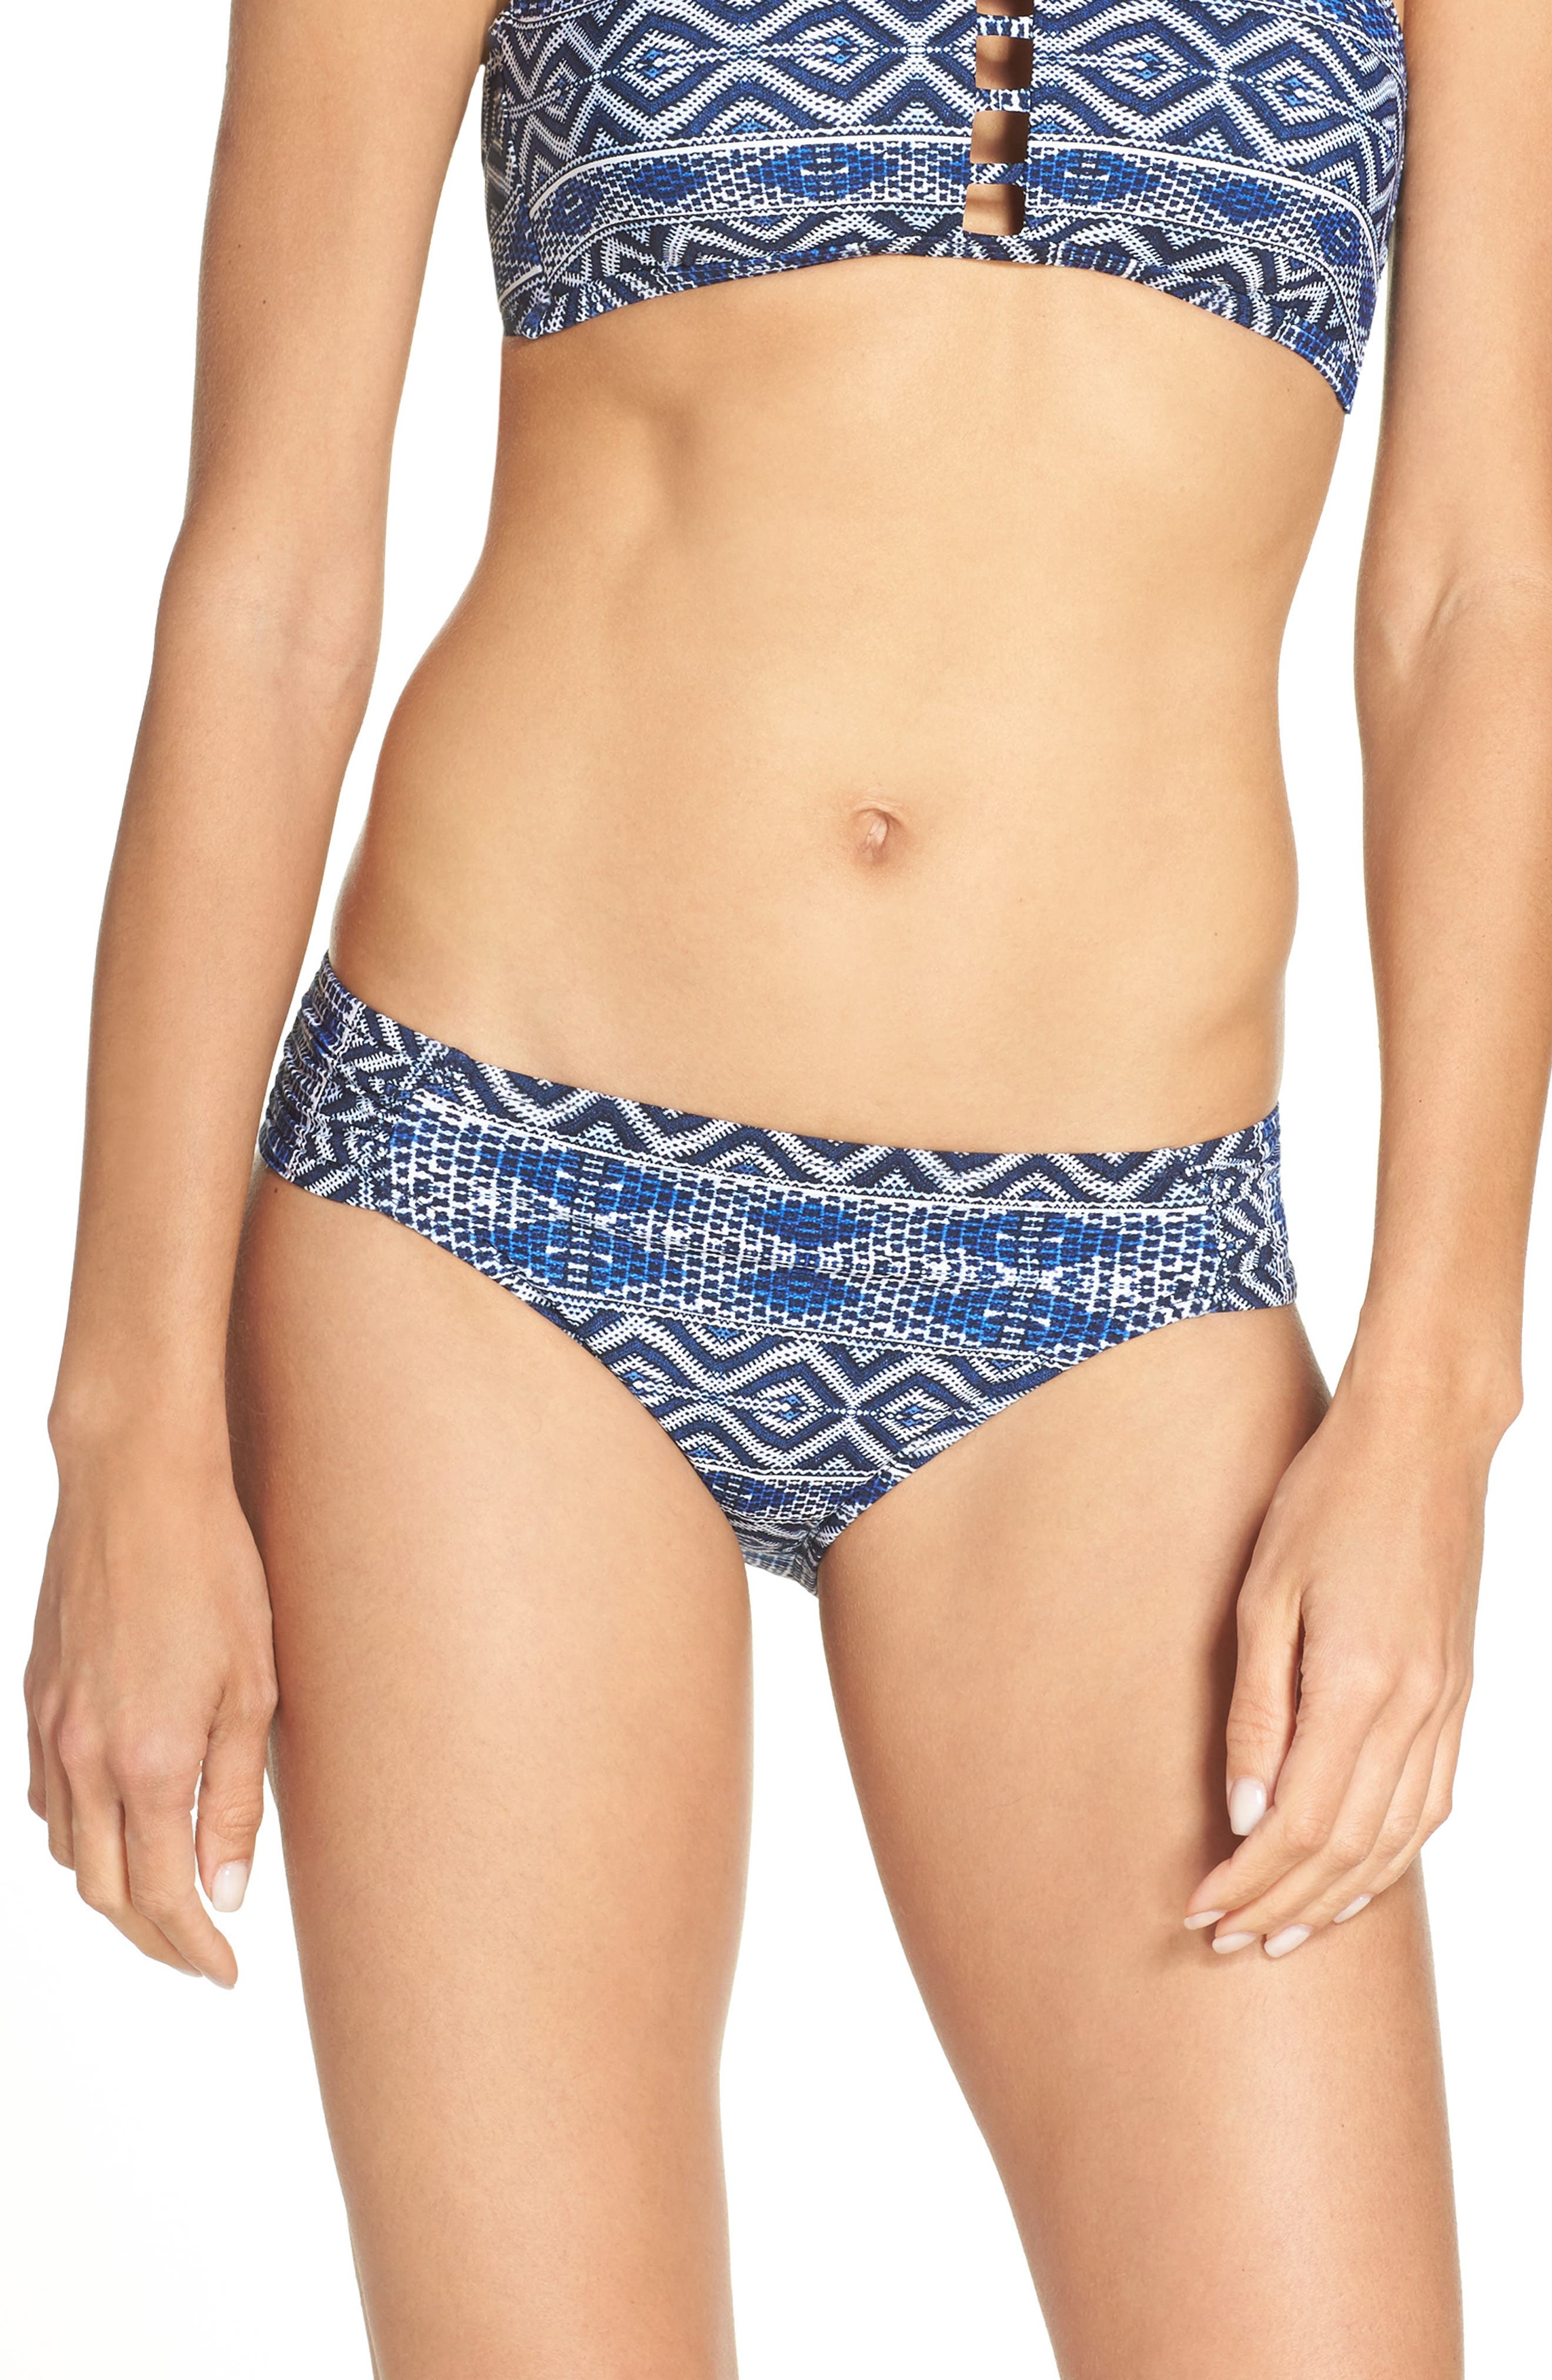 Designer Jeans Hipster Bikini Bottoms,                             Main thumbnail 1, color,                             401